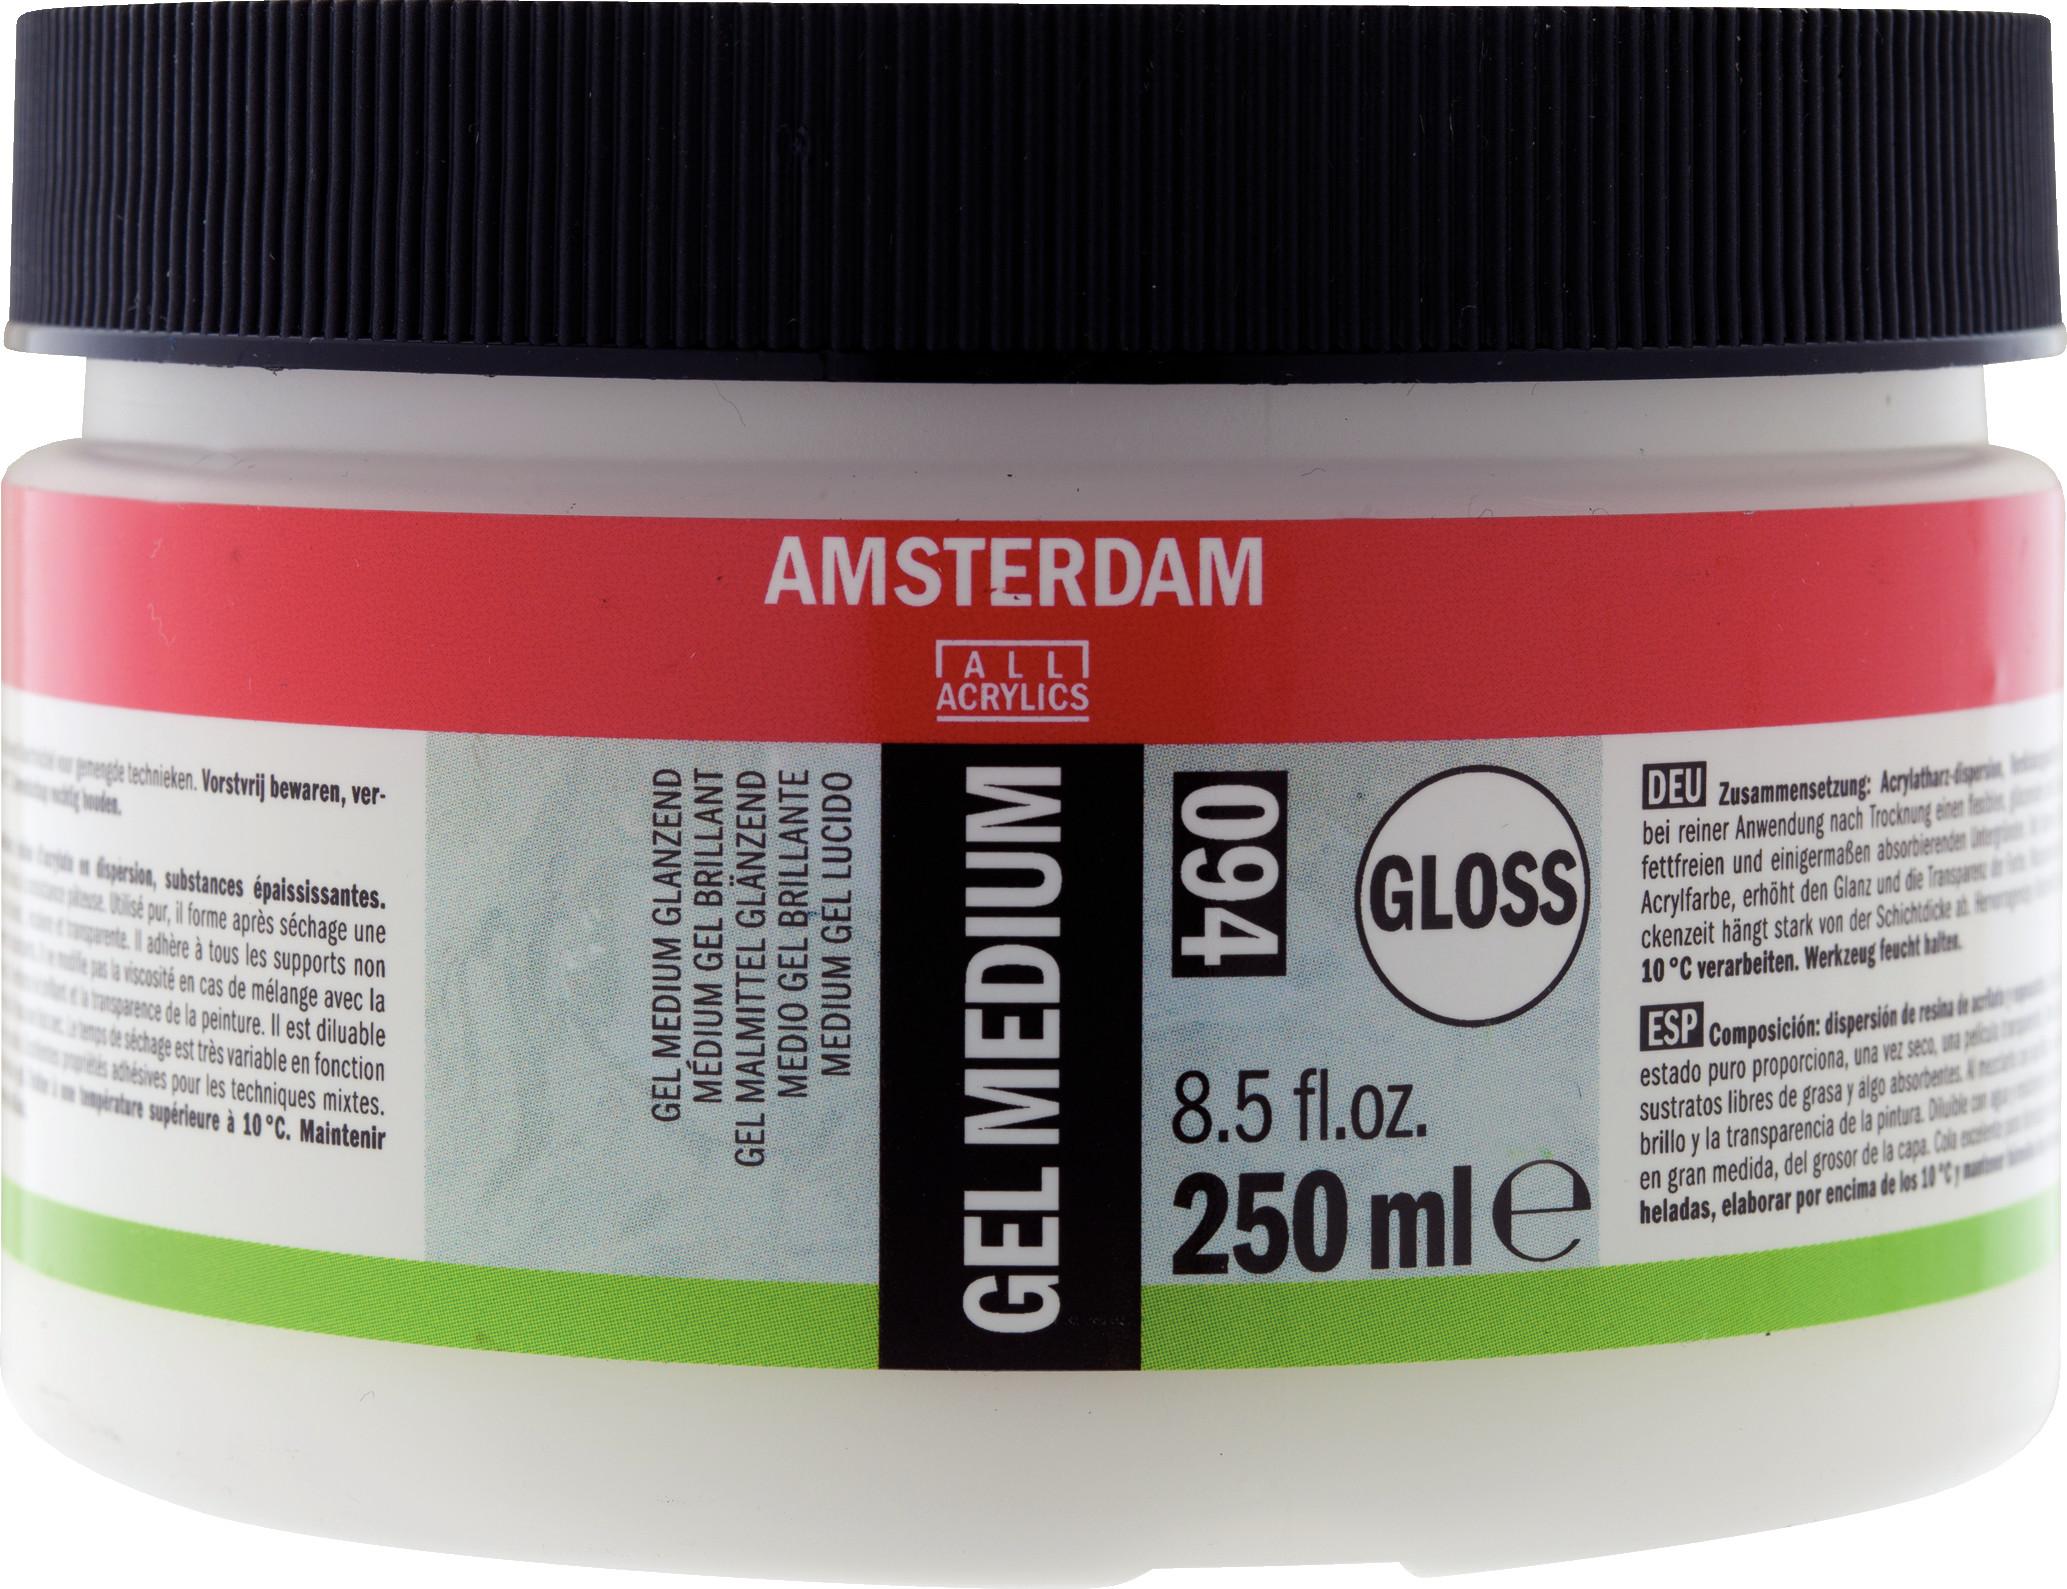 Amsterdam Gel Medium Gloss Jar 250 ml